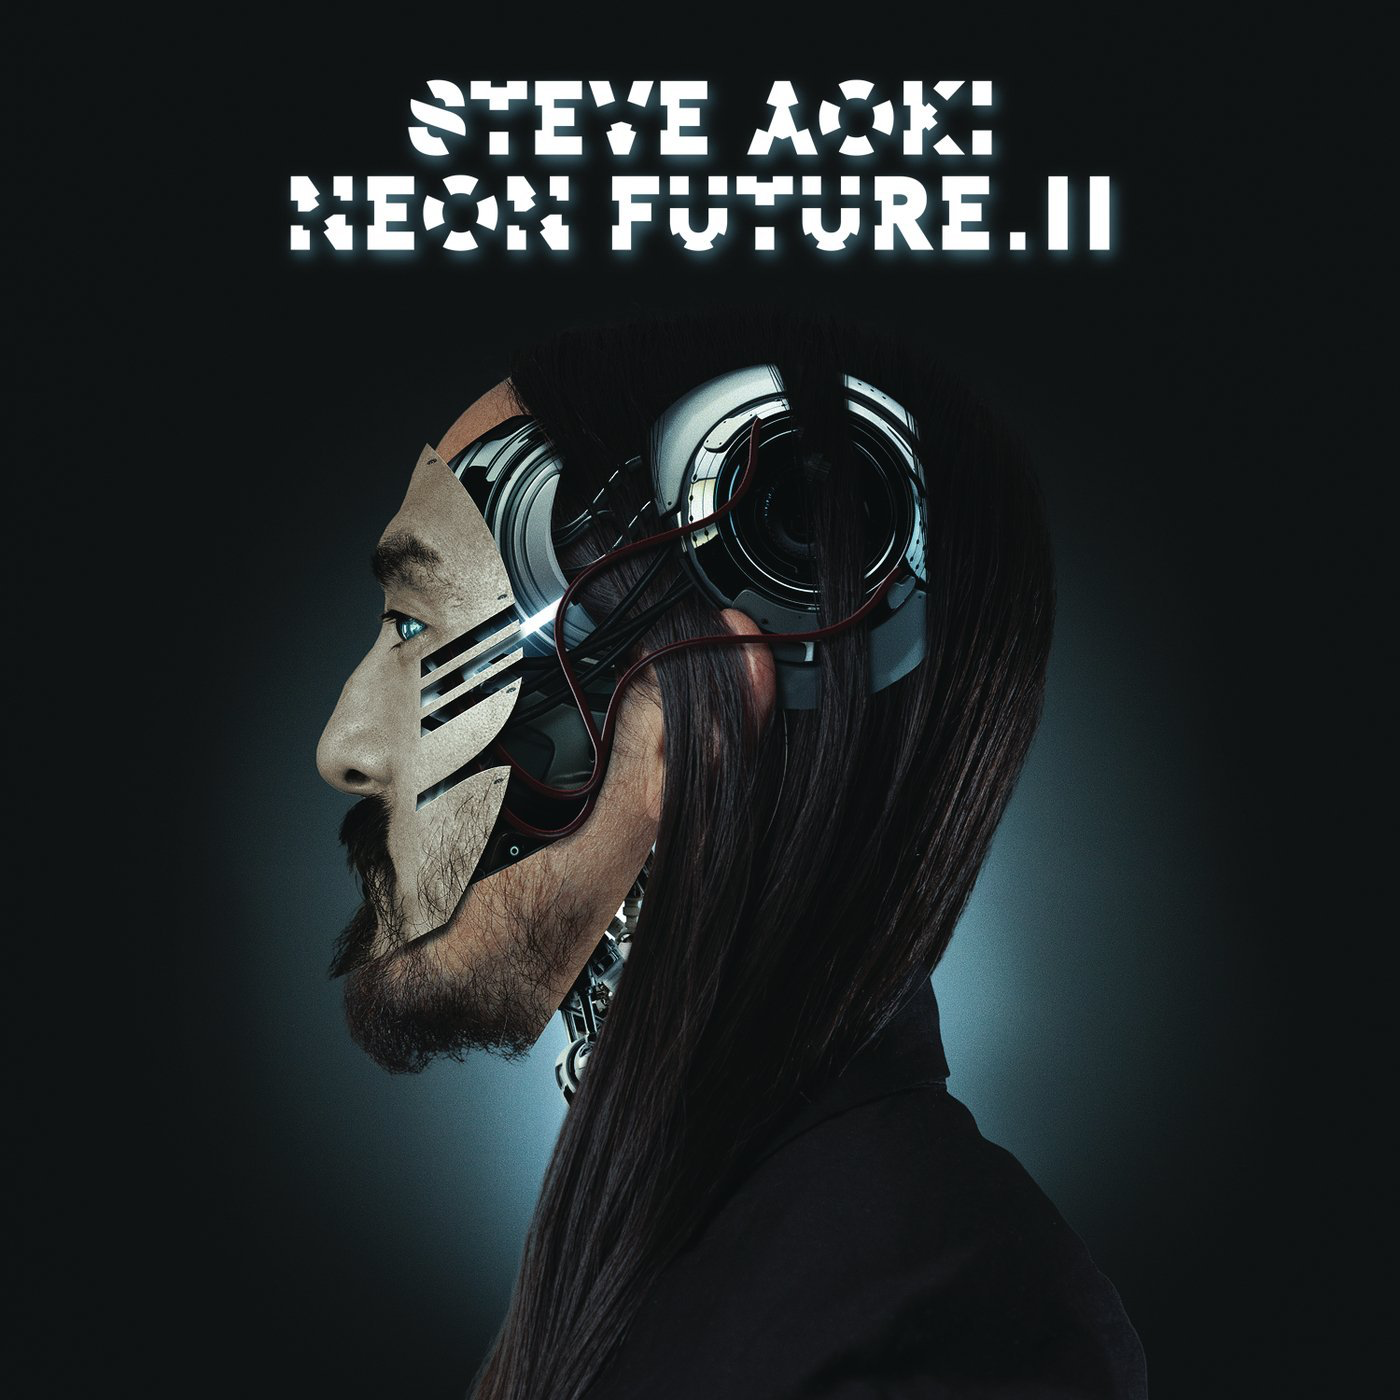 Steve-Aoki-Neon-Future-II-2015-1400x1400